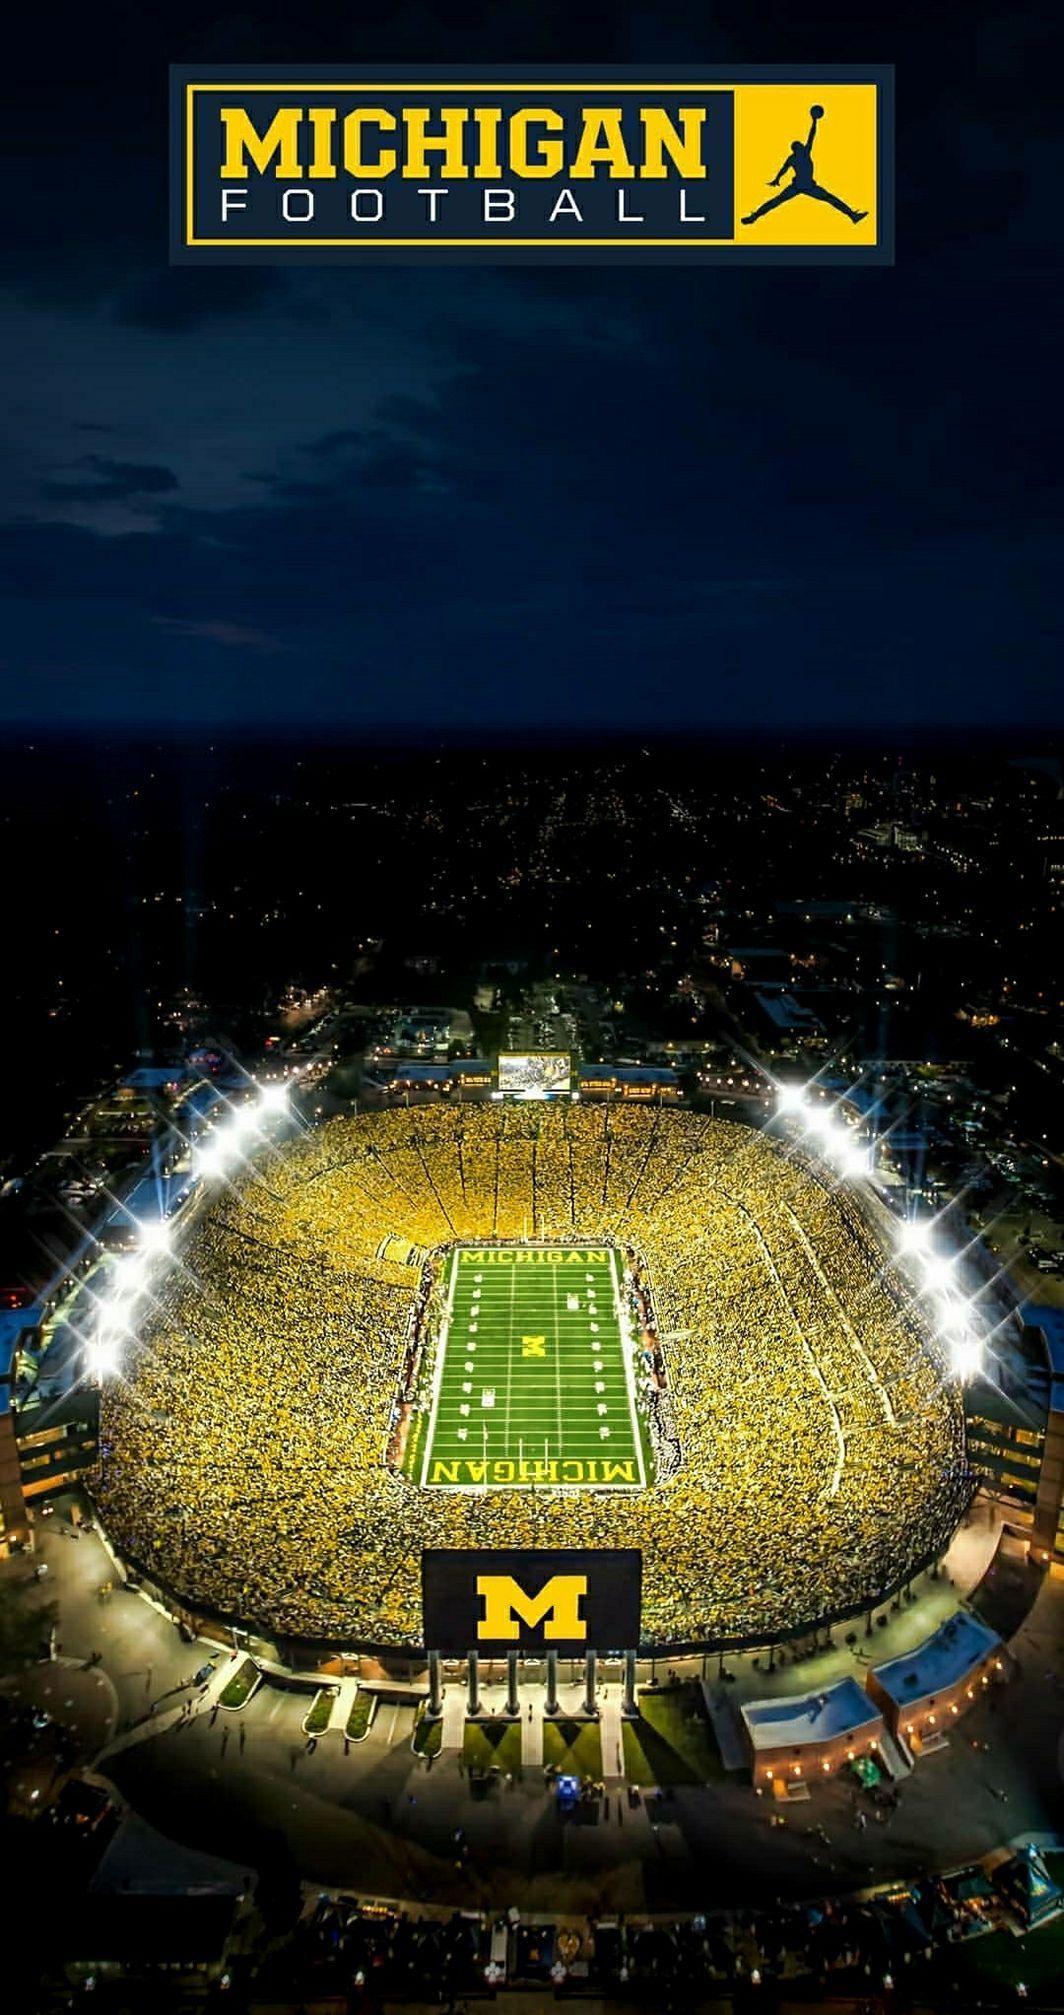 Pin By Bill Mohler On University Of Michigan Michigan Go Blue Michigan Wolverines Football Michigan